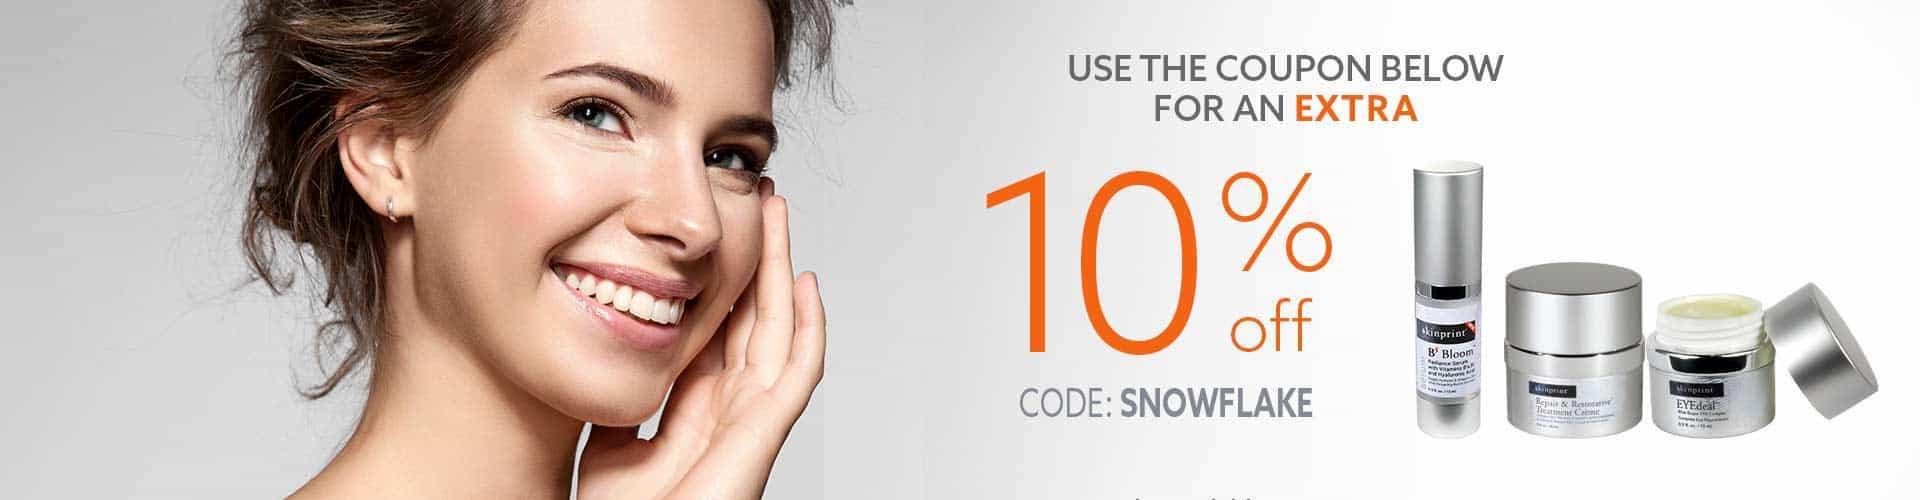 10% off SNOWFLAKE